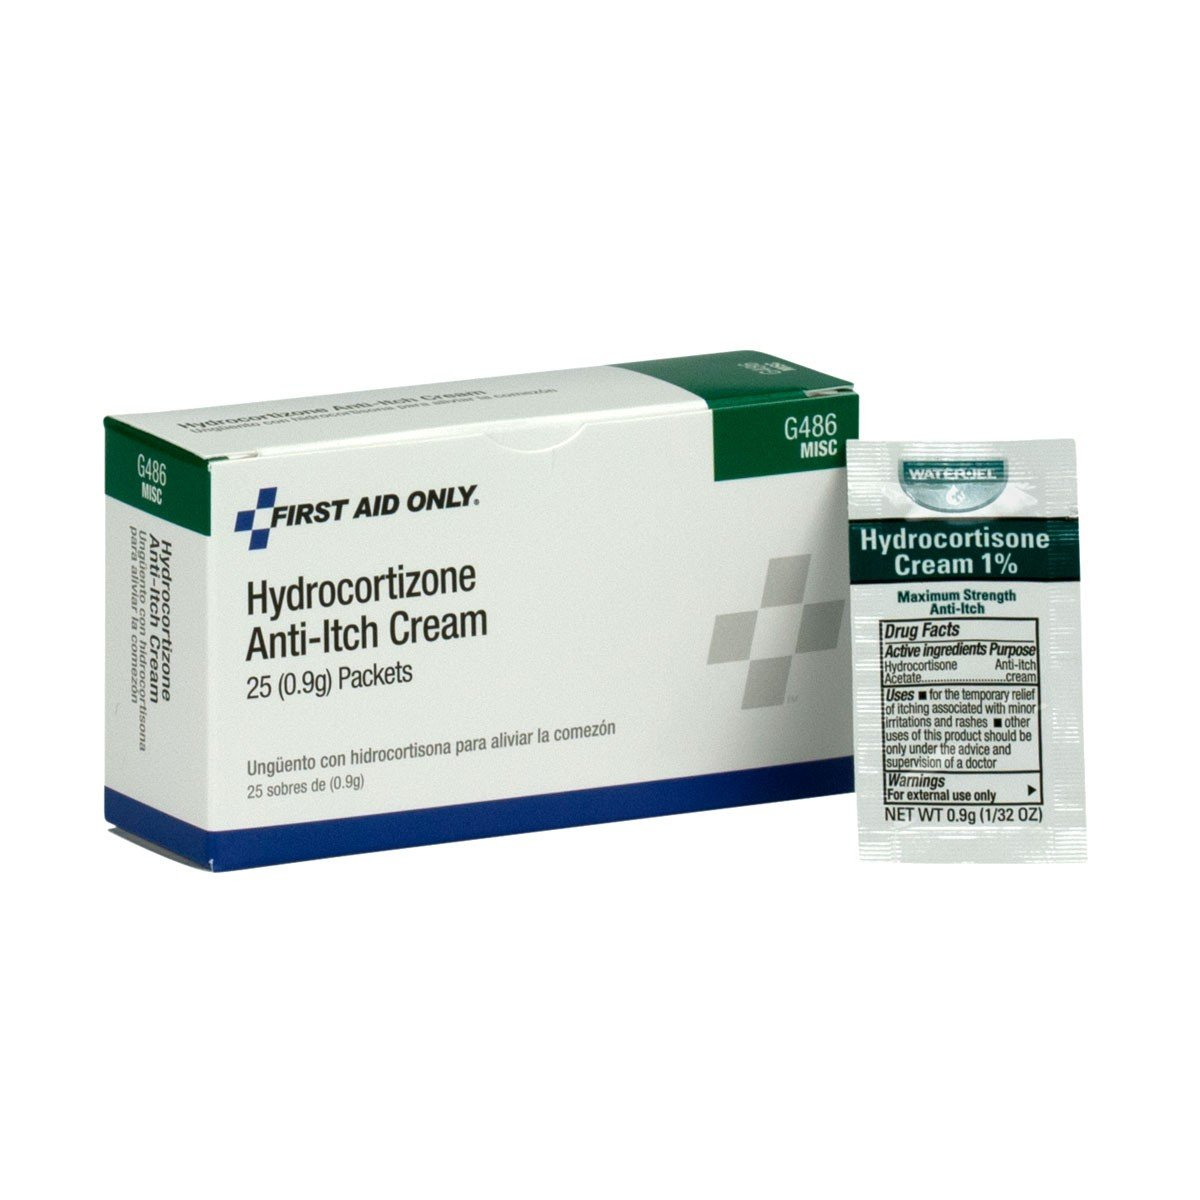 FIRST Hydrocortisone Reviews